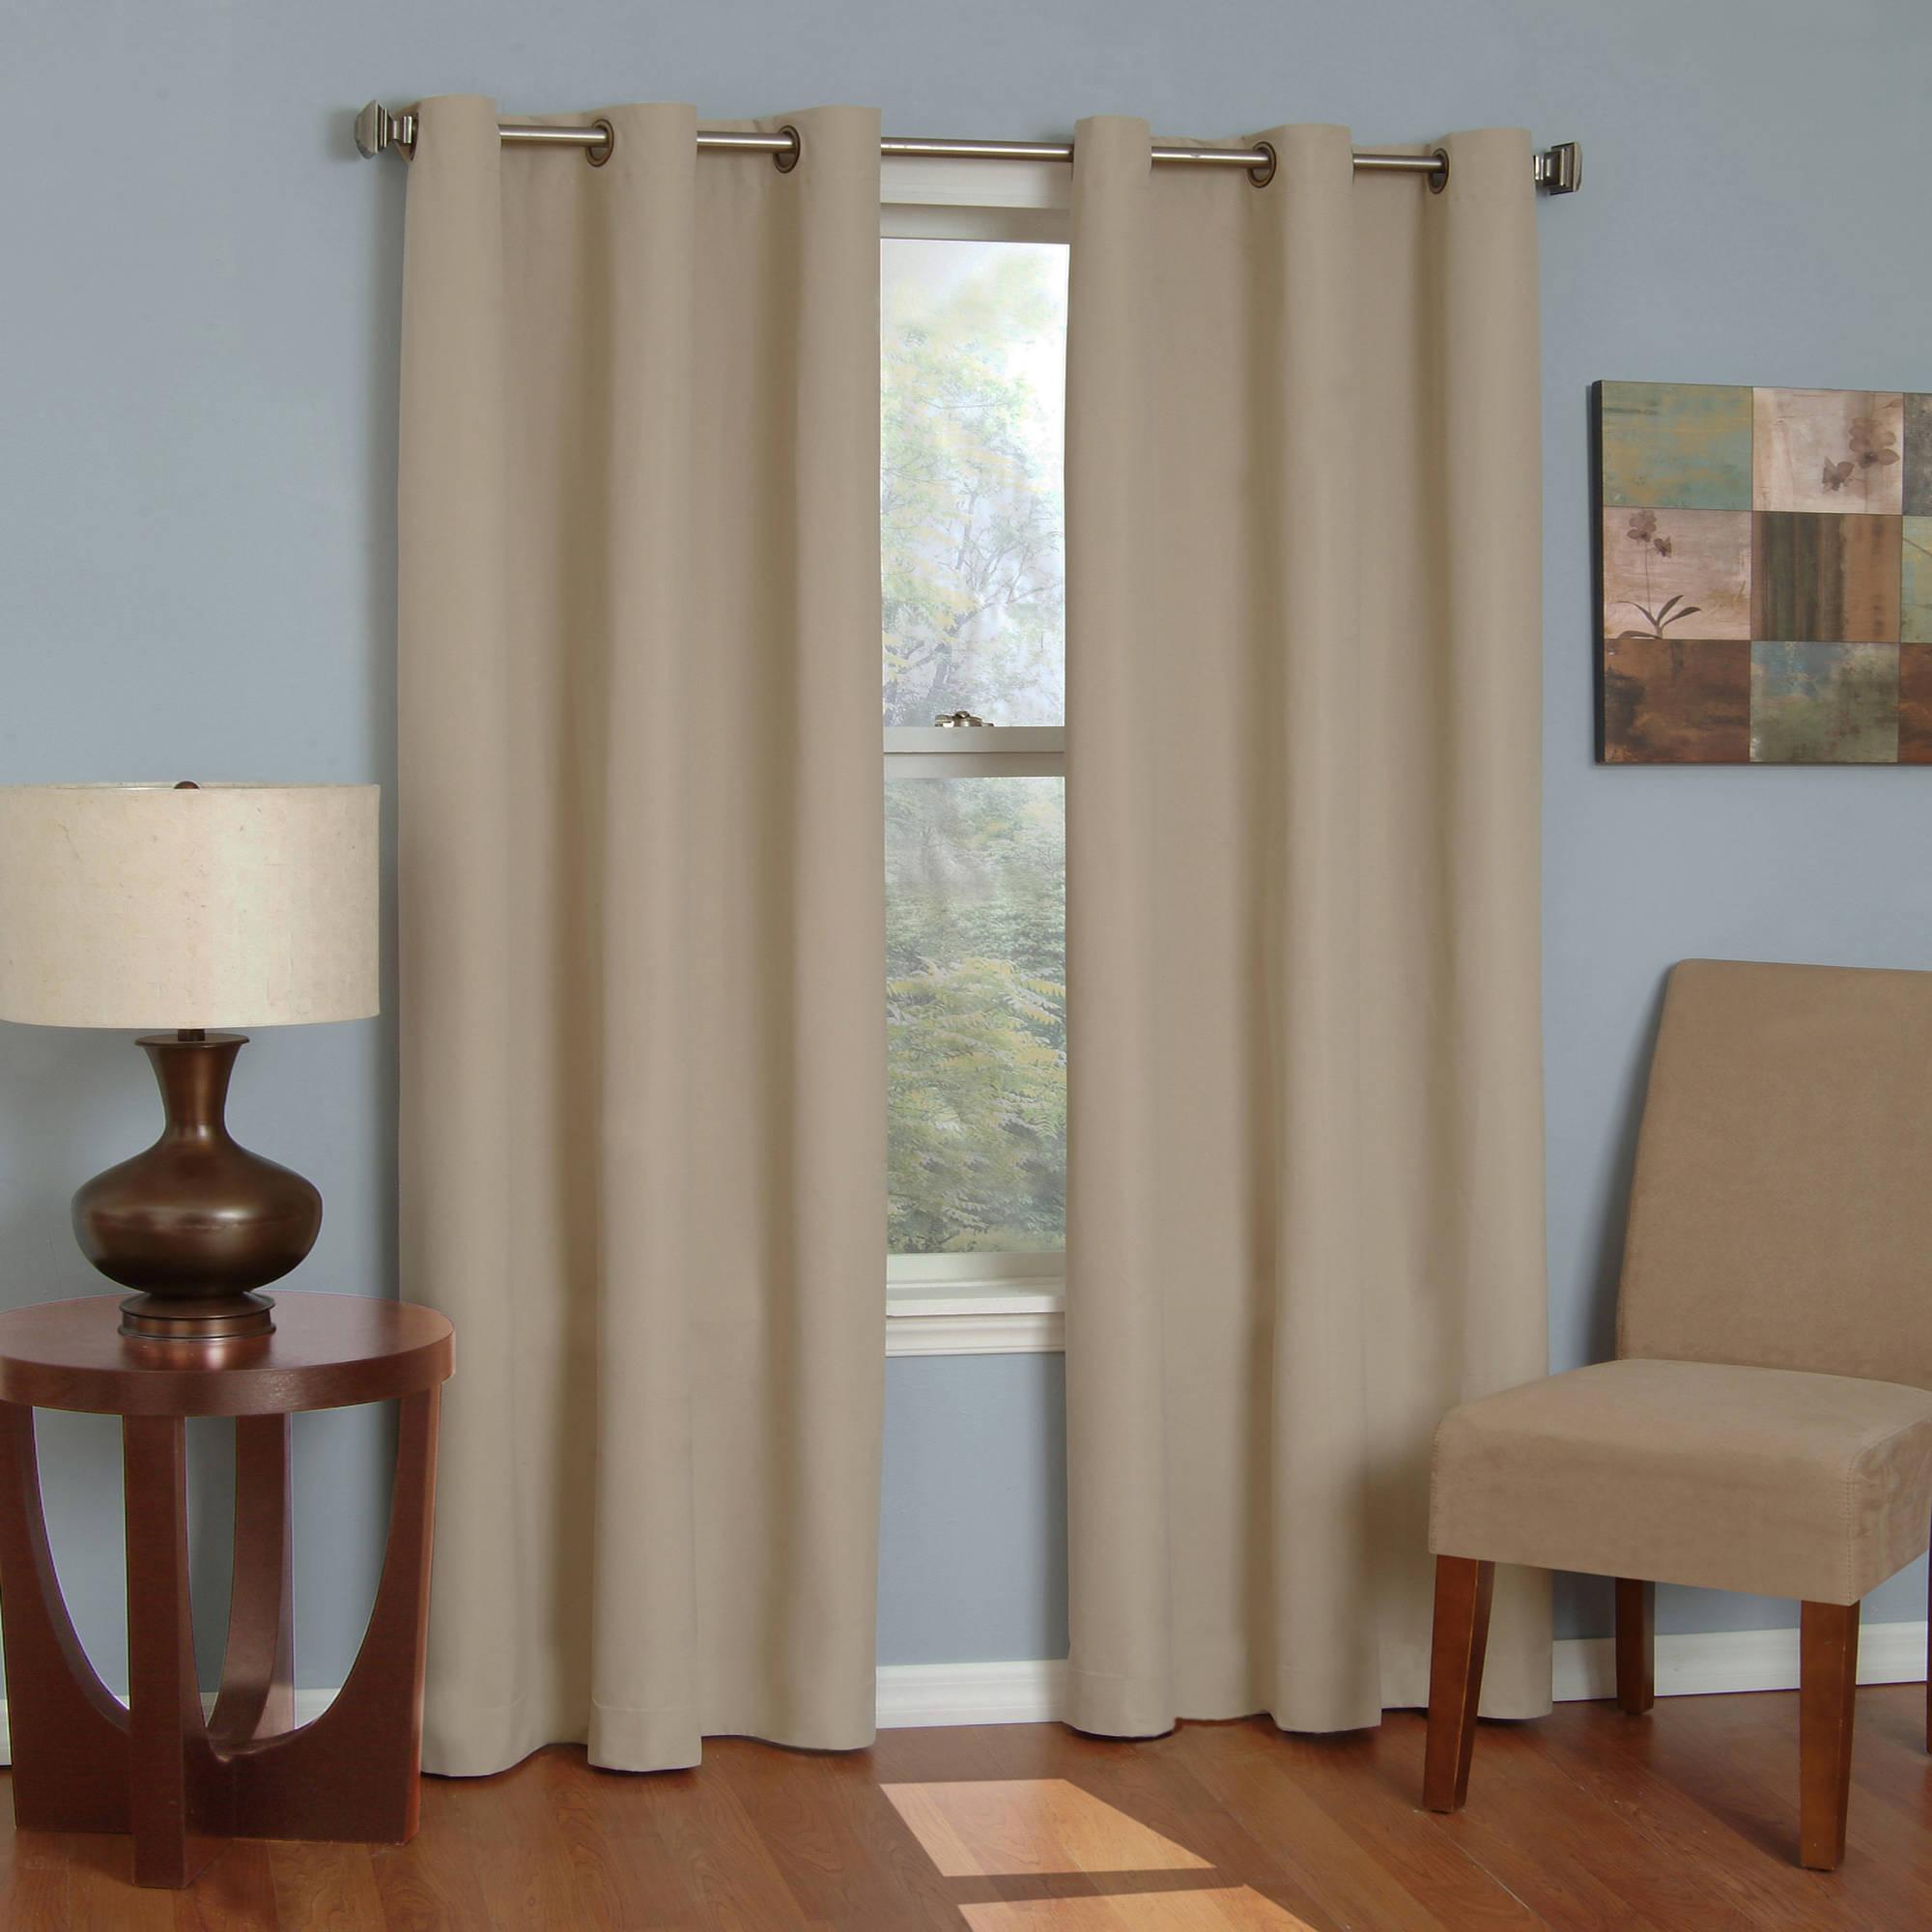 Eclipse Microfiber Energy Efficient Grommet Blackout Curtain Panel With Regard To Blackout Grommet Curtain Panels (View 2 of 20)